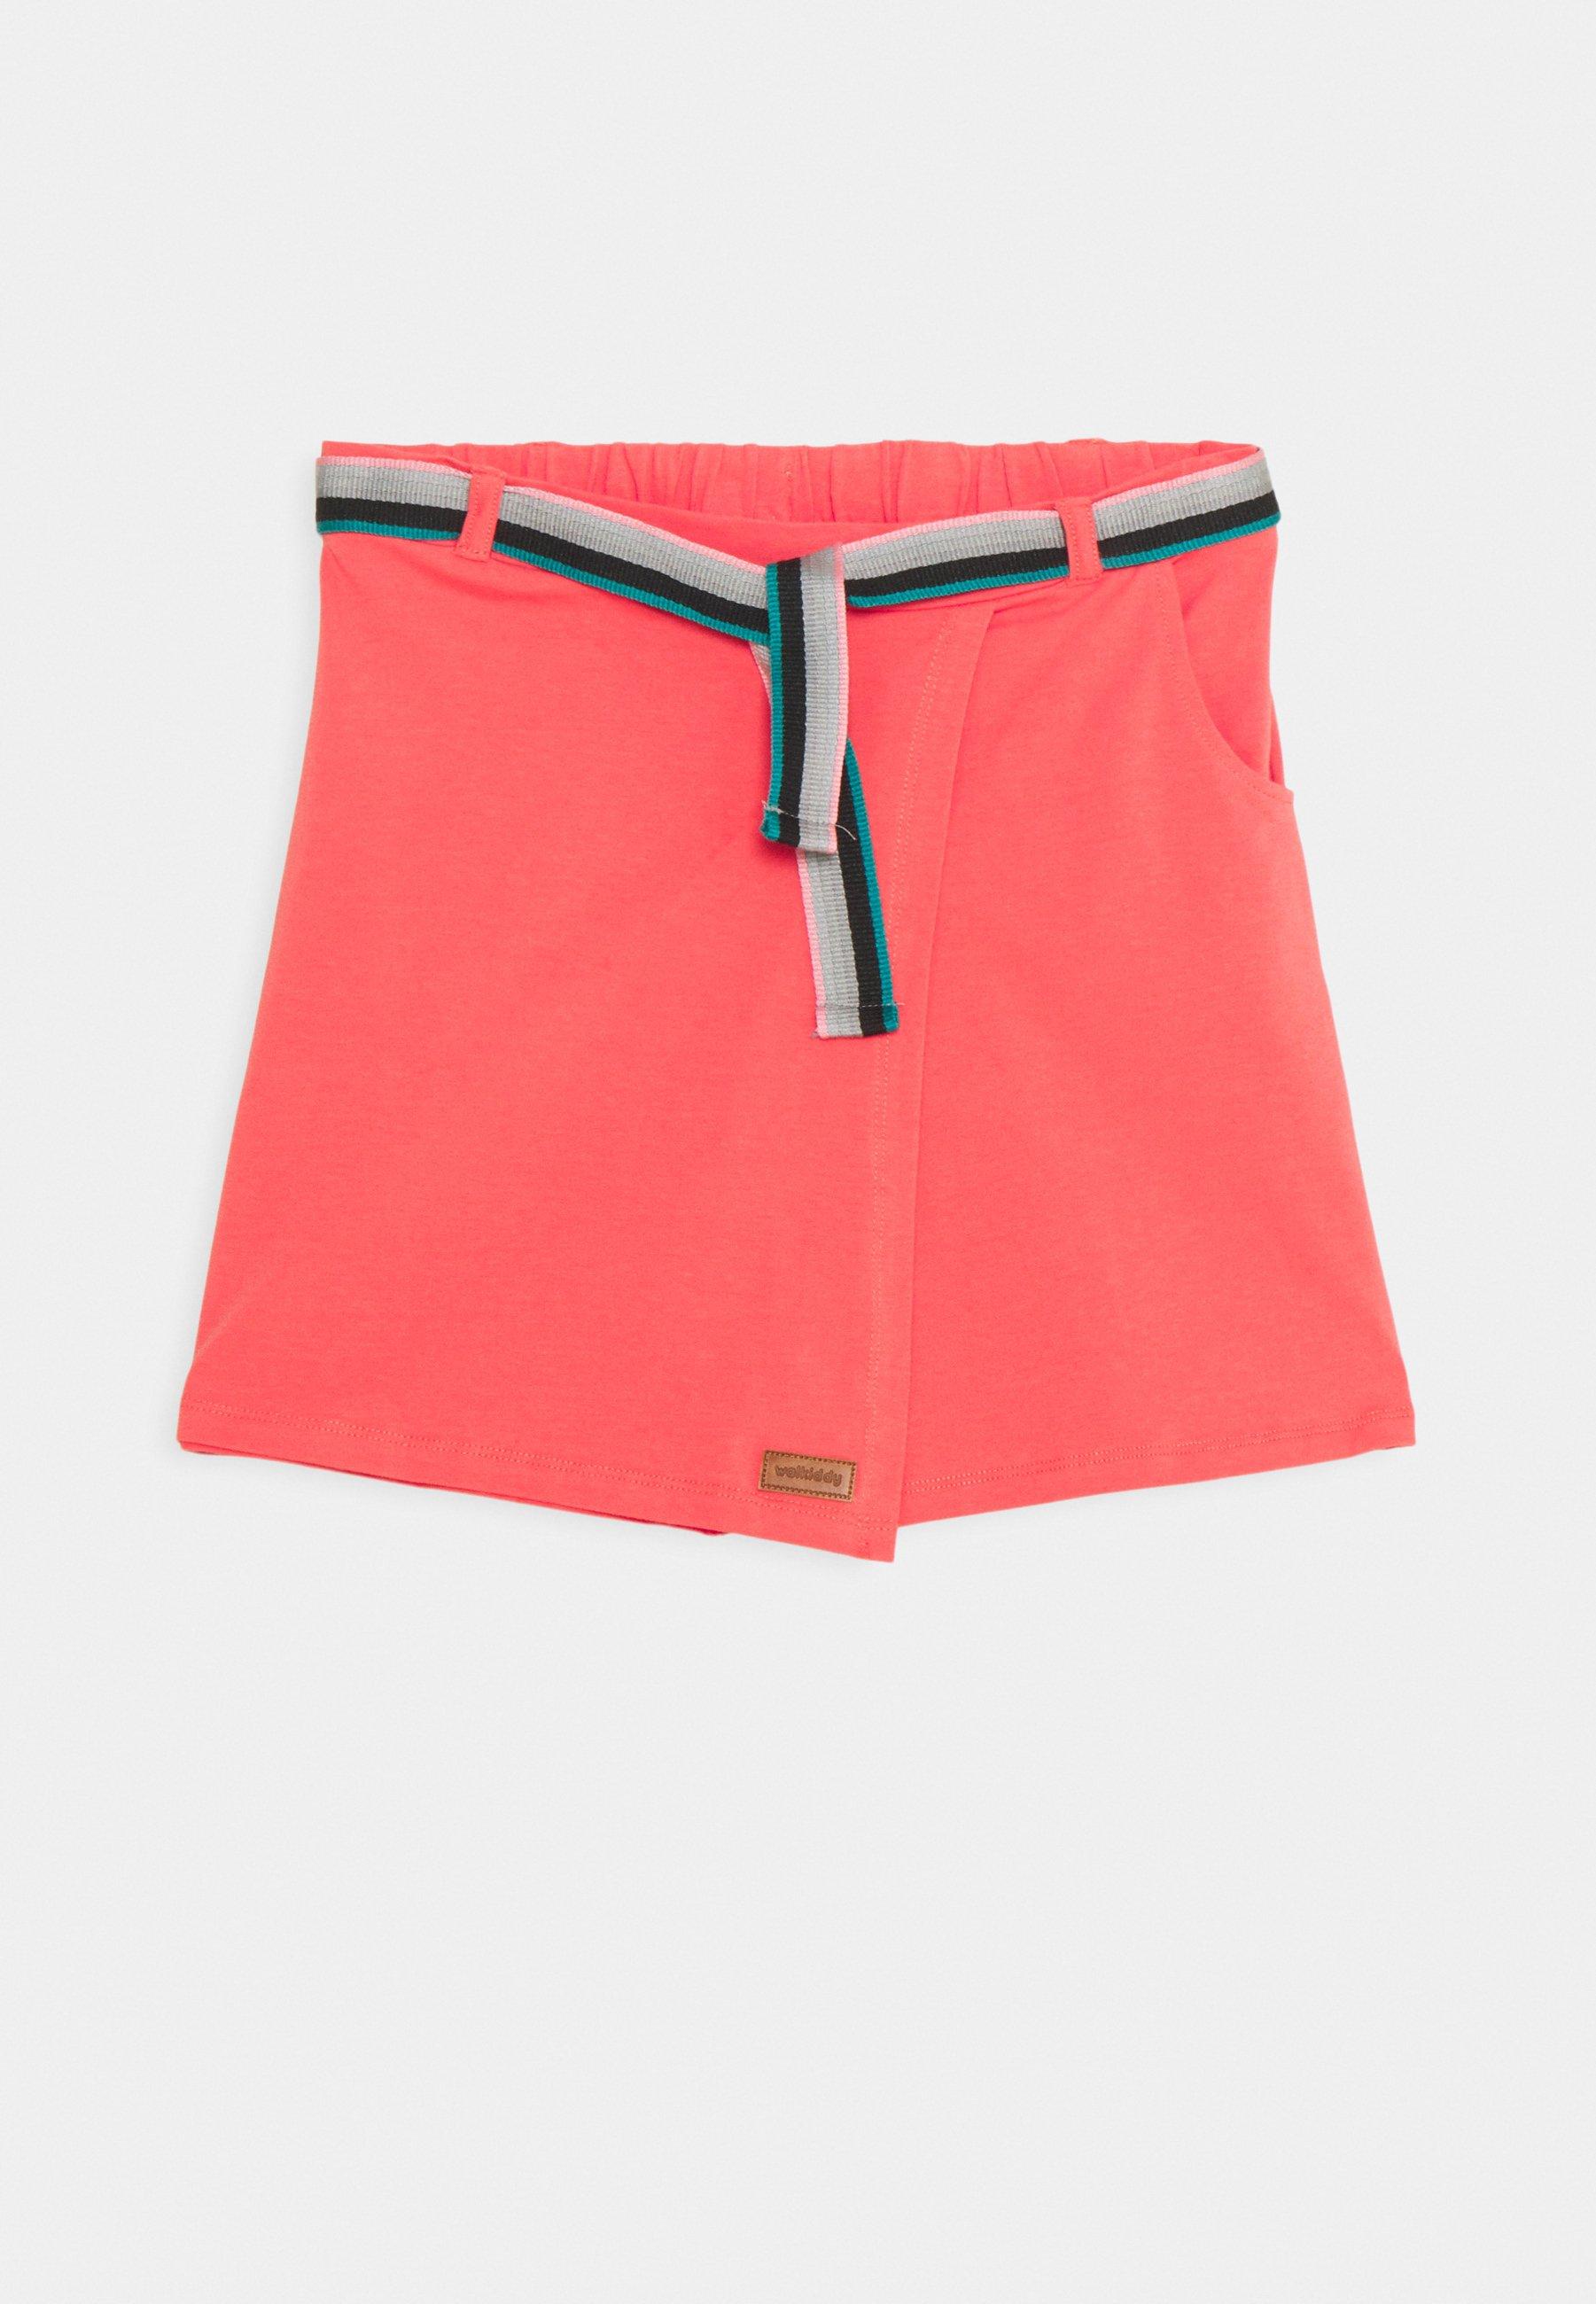 Kids SKORT WITH BELT - Shorts